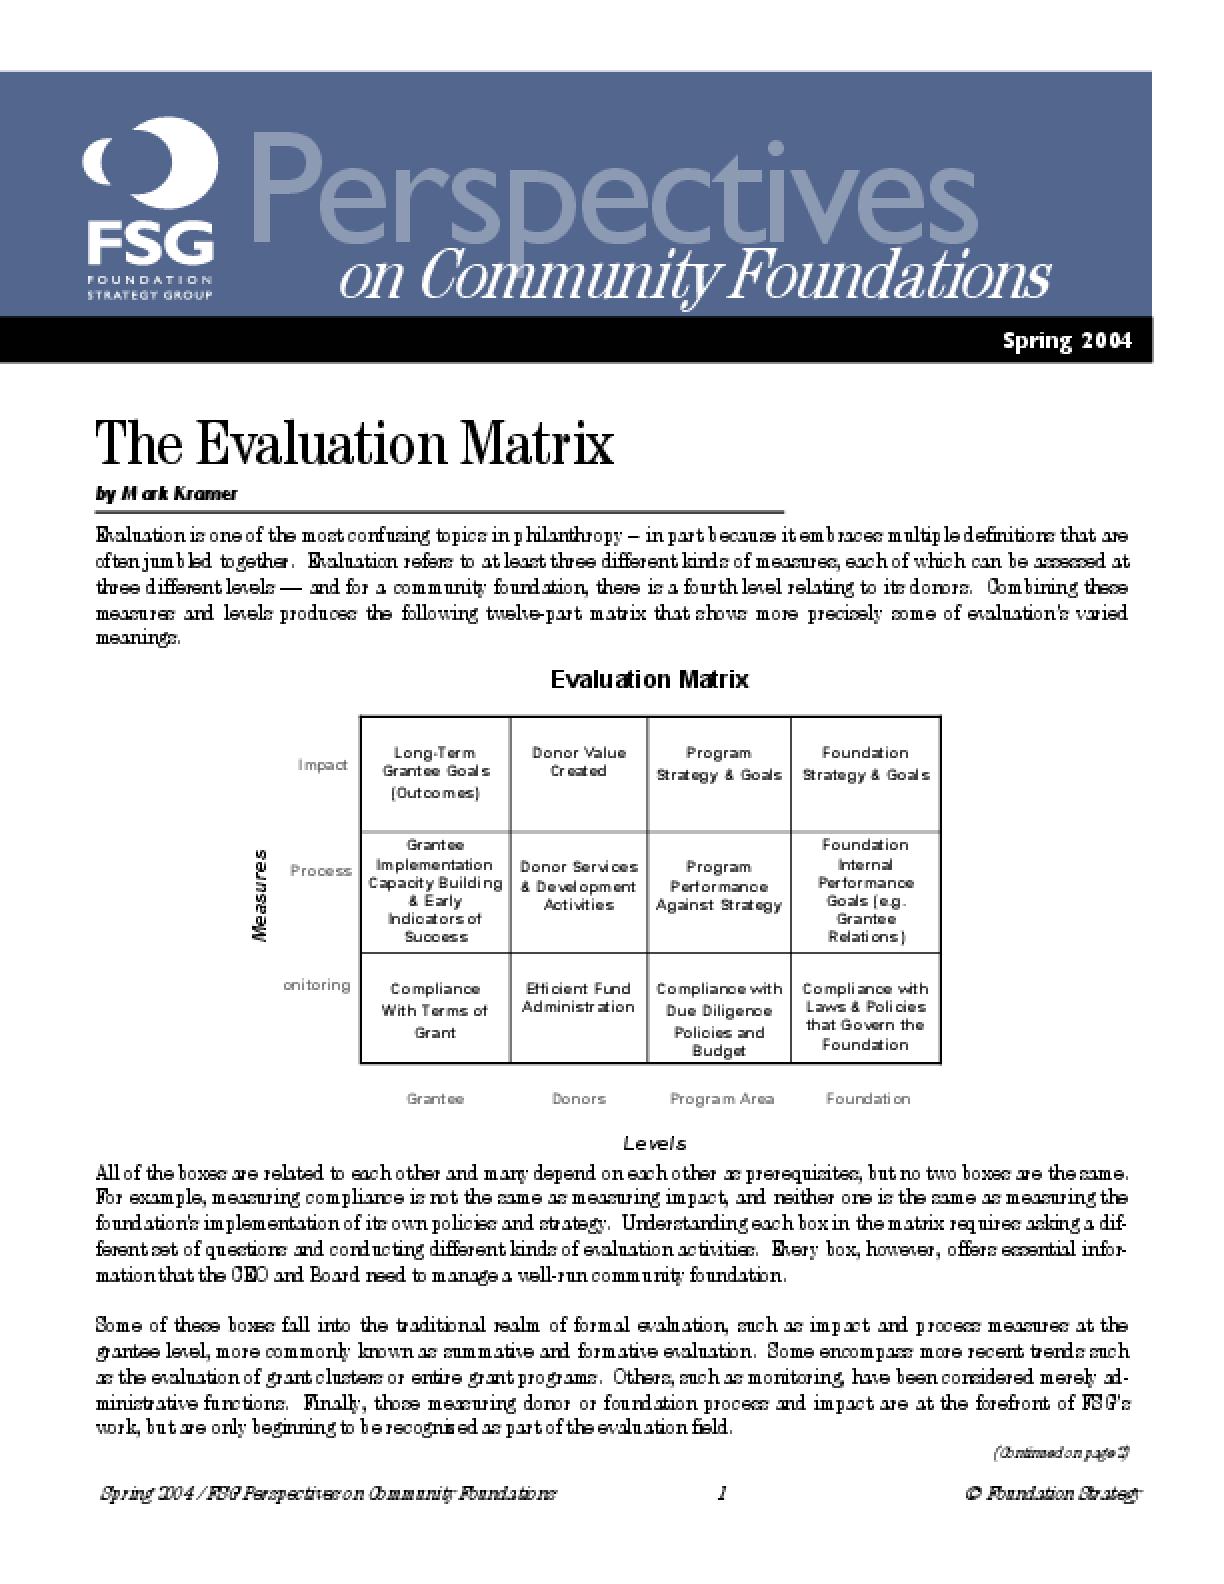 The Evaluation Matrix